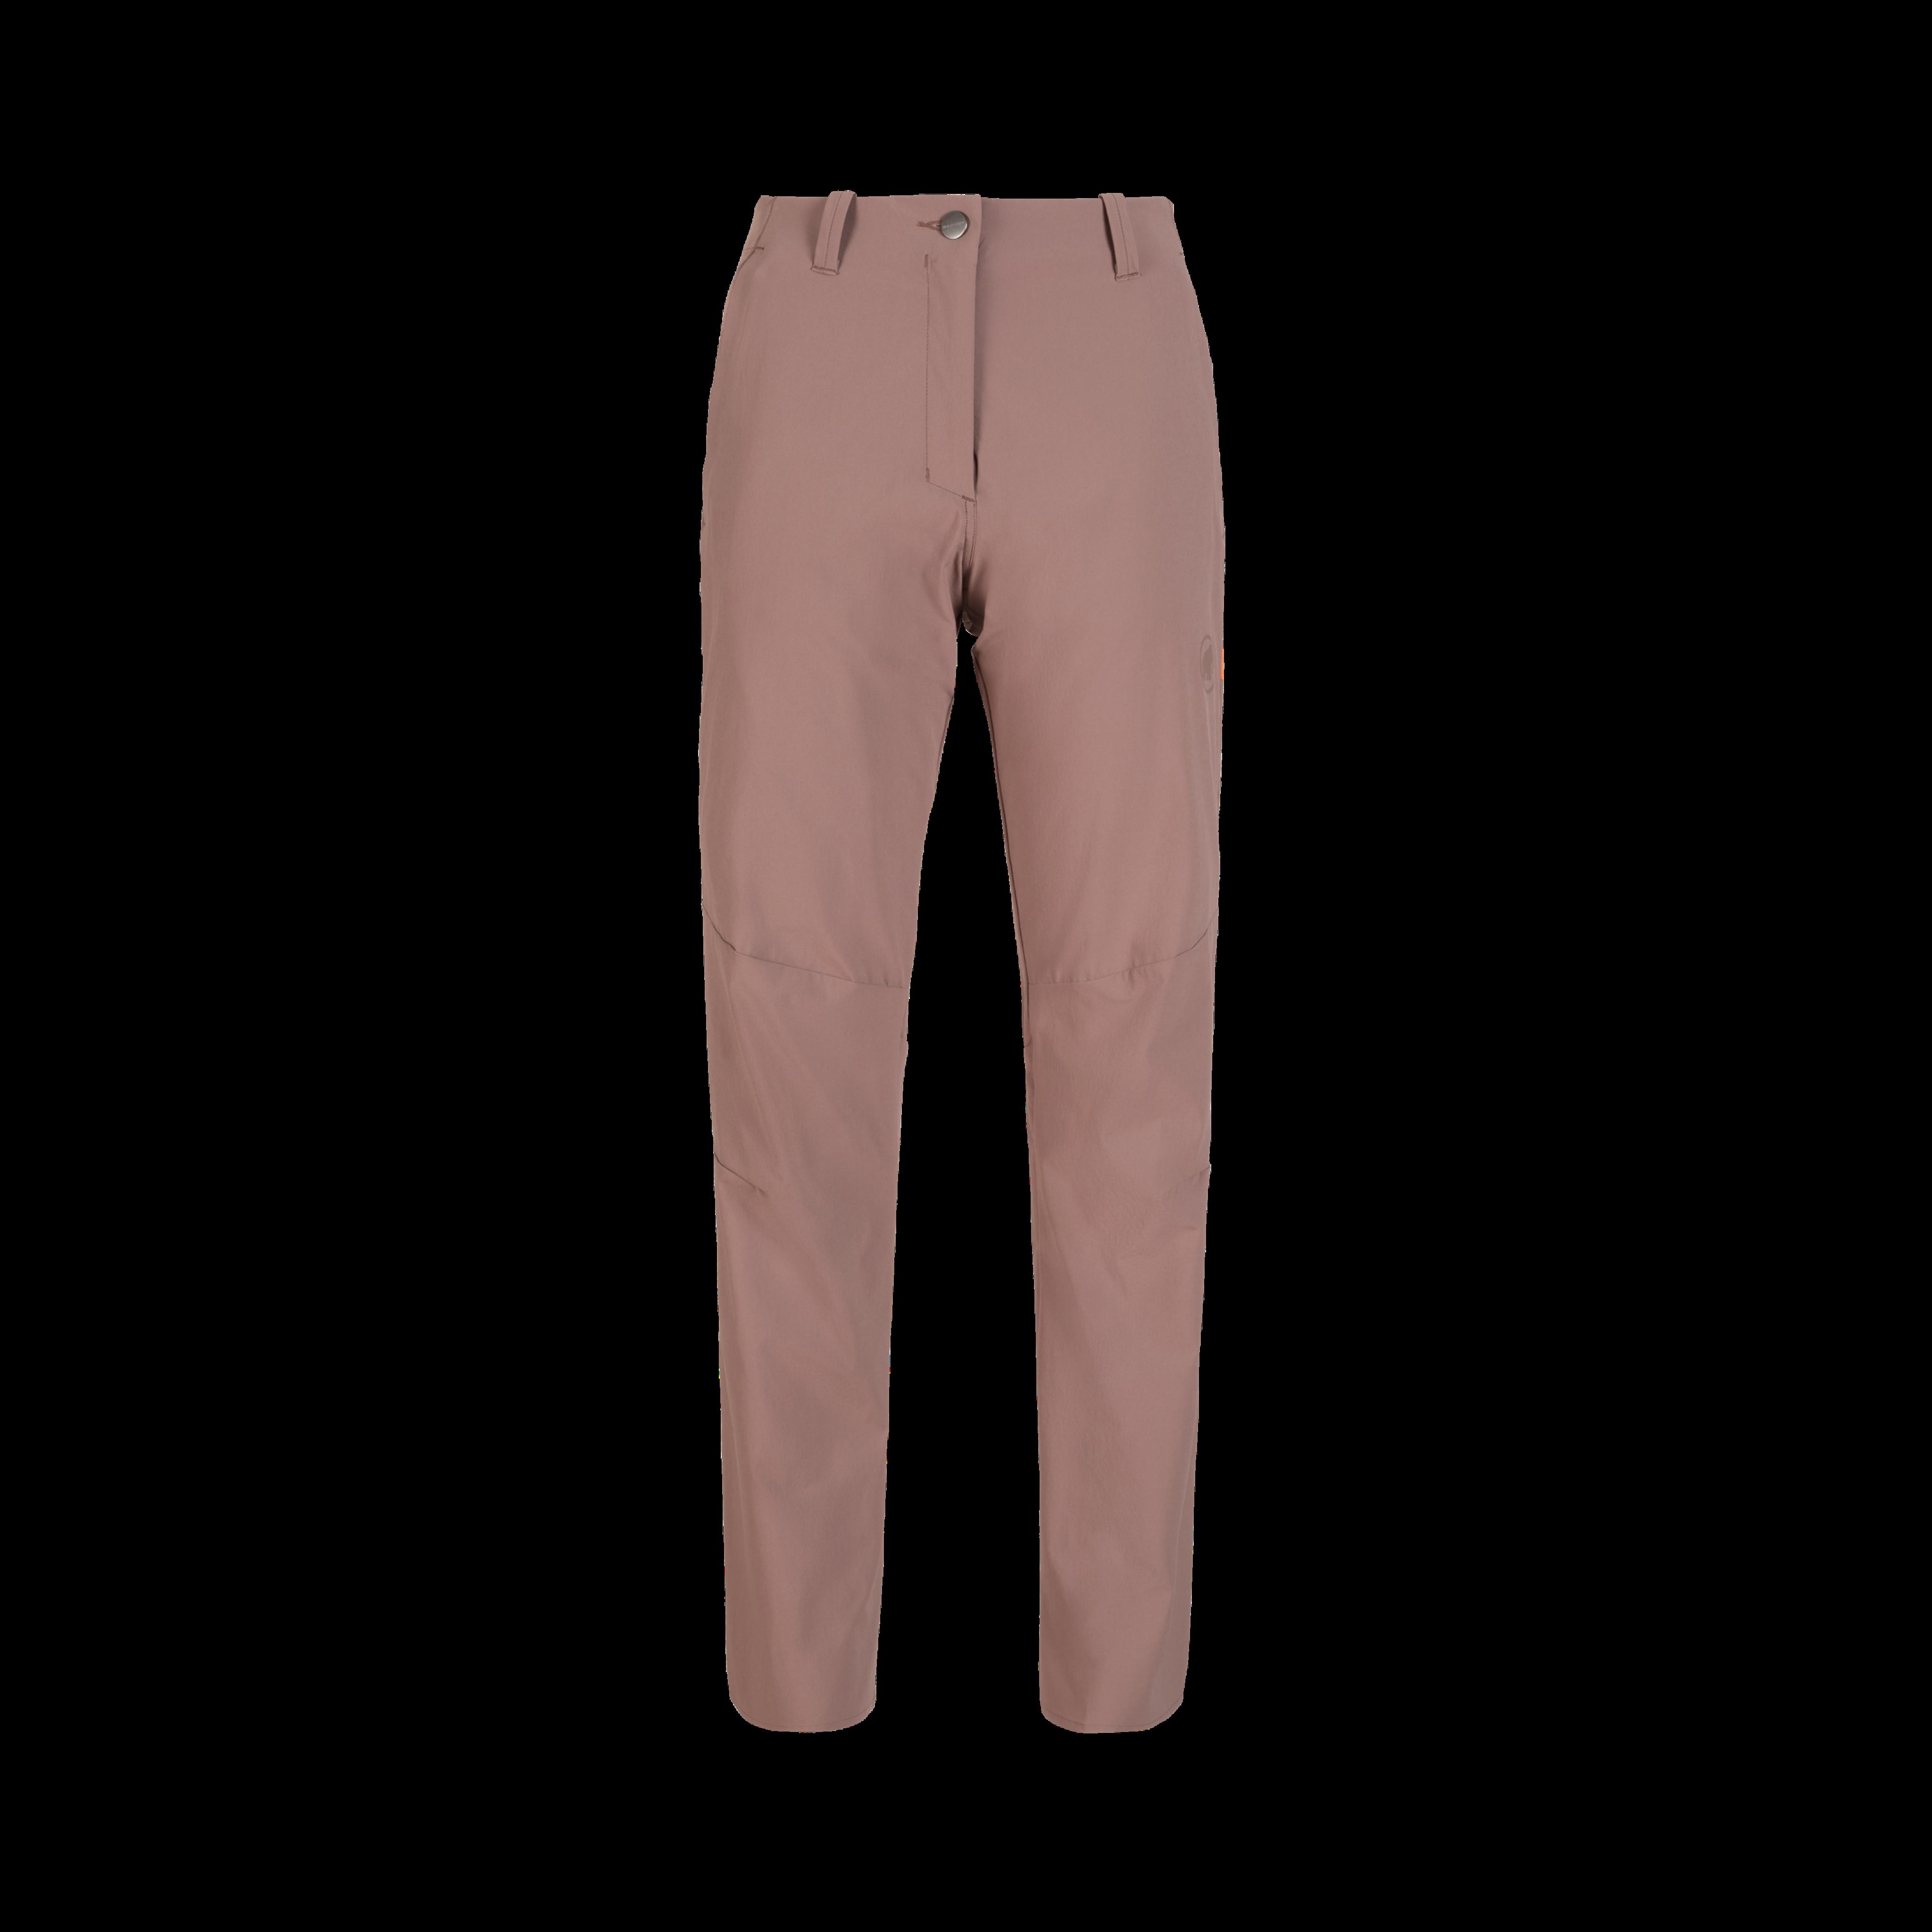 Runbold Pants Women - deep taupe, normal, UK 12 thumbnail